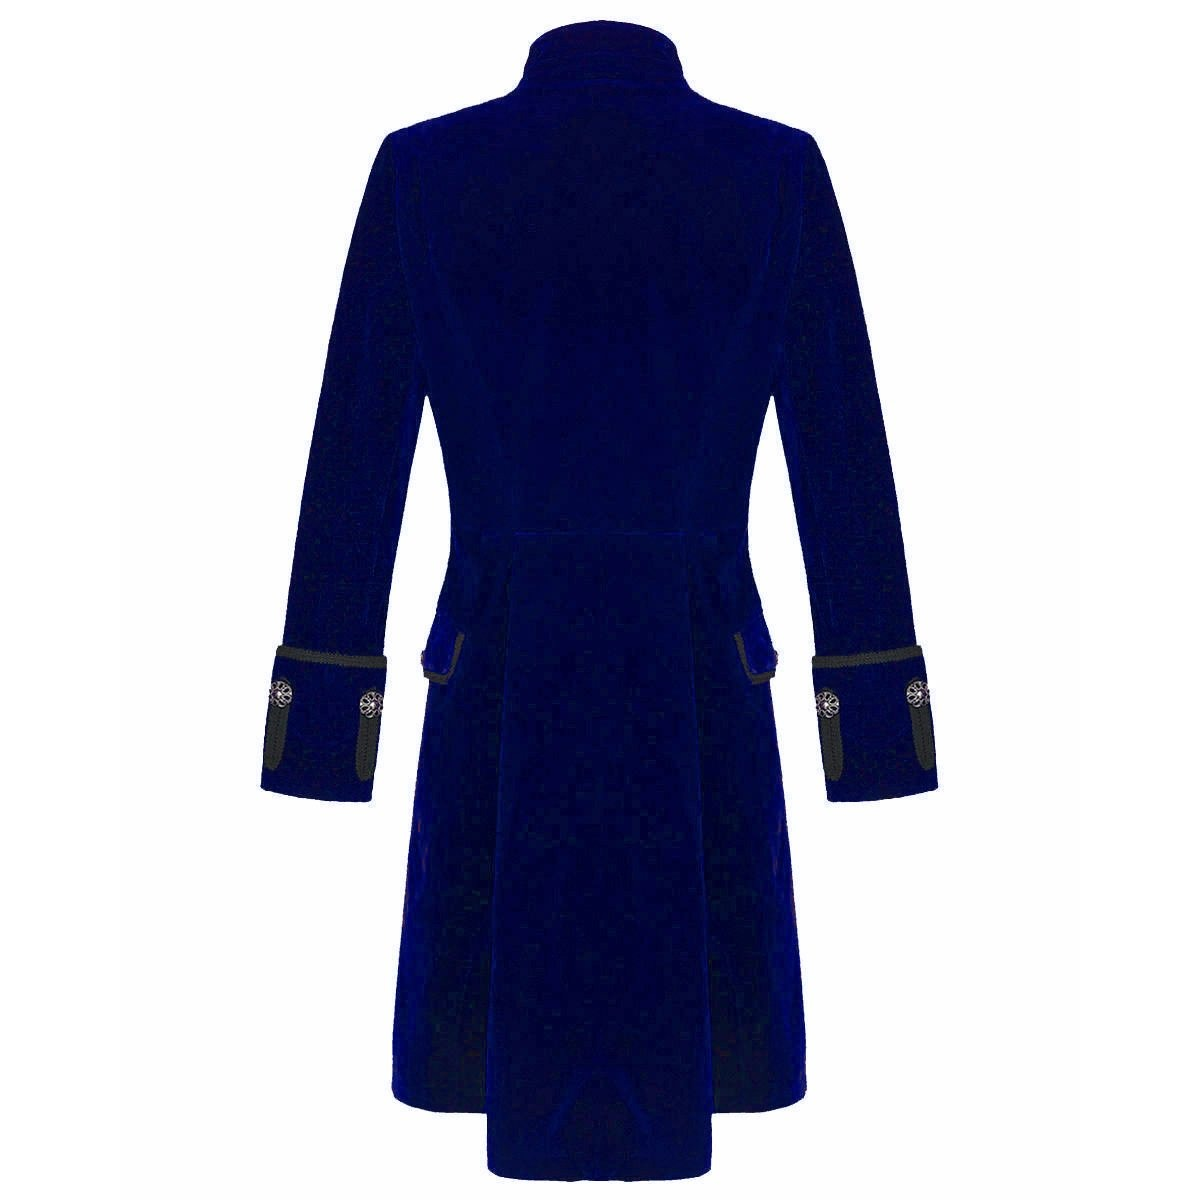 Darkrock Men's Velvet Renaissance Blue Handmade Frock Coat (1)